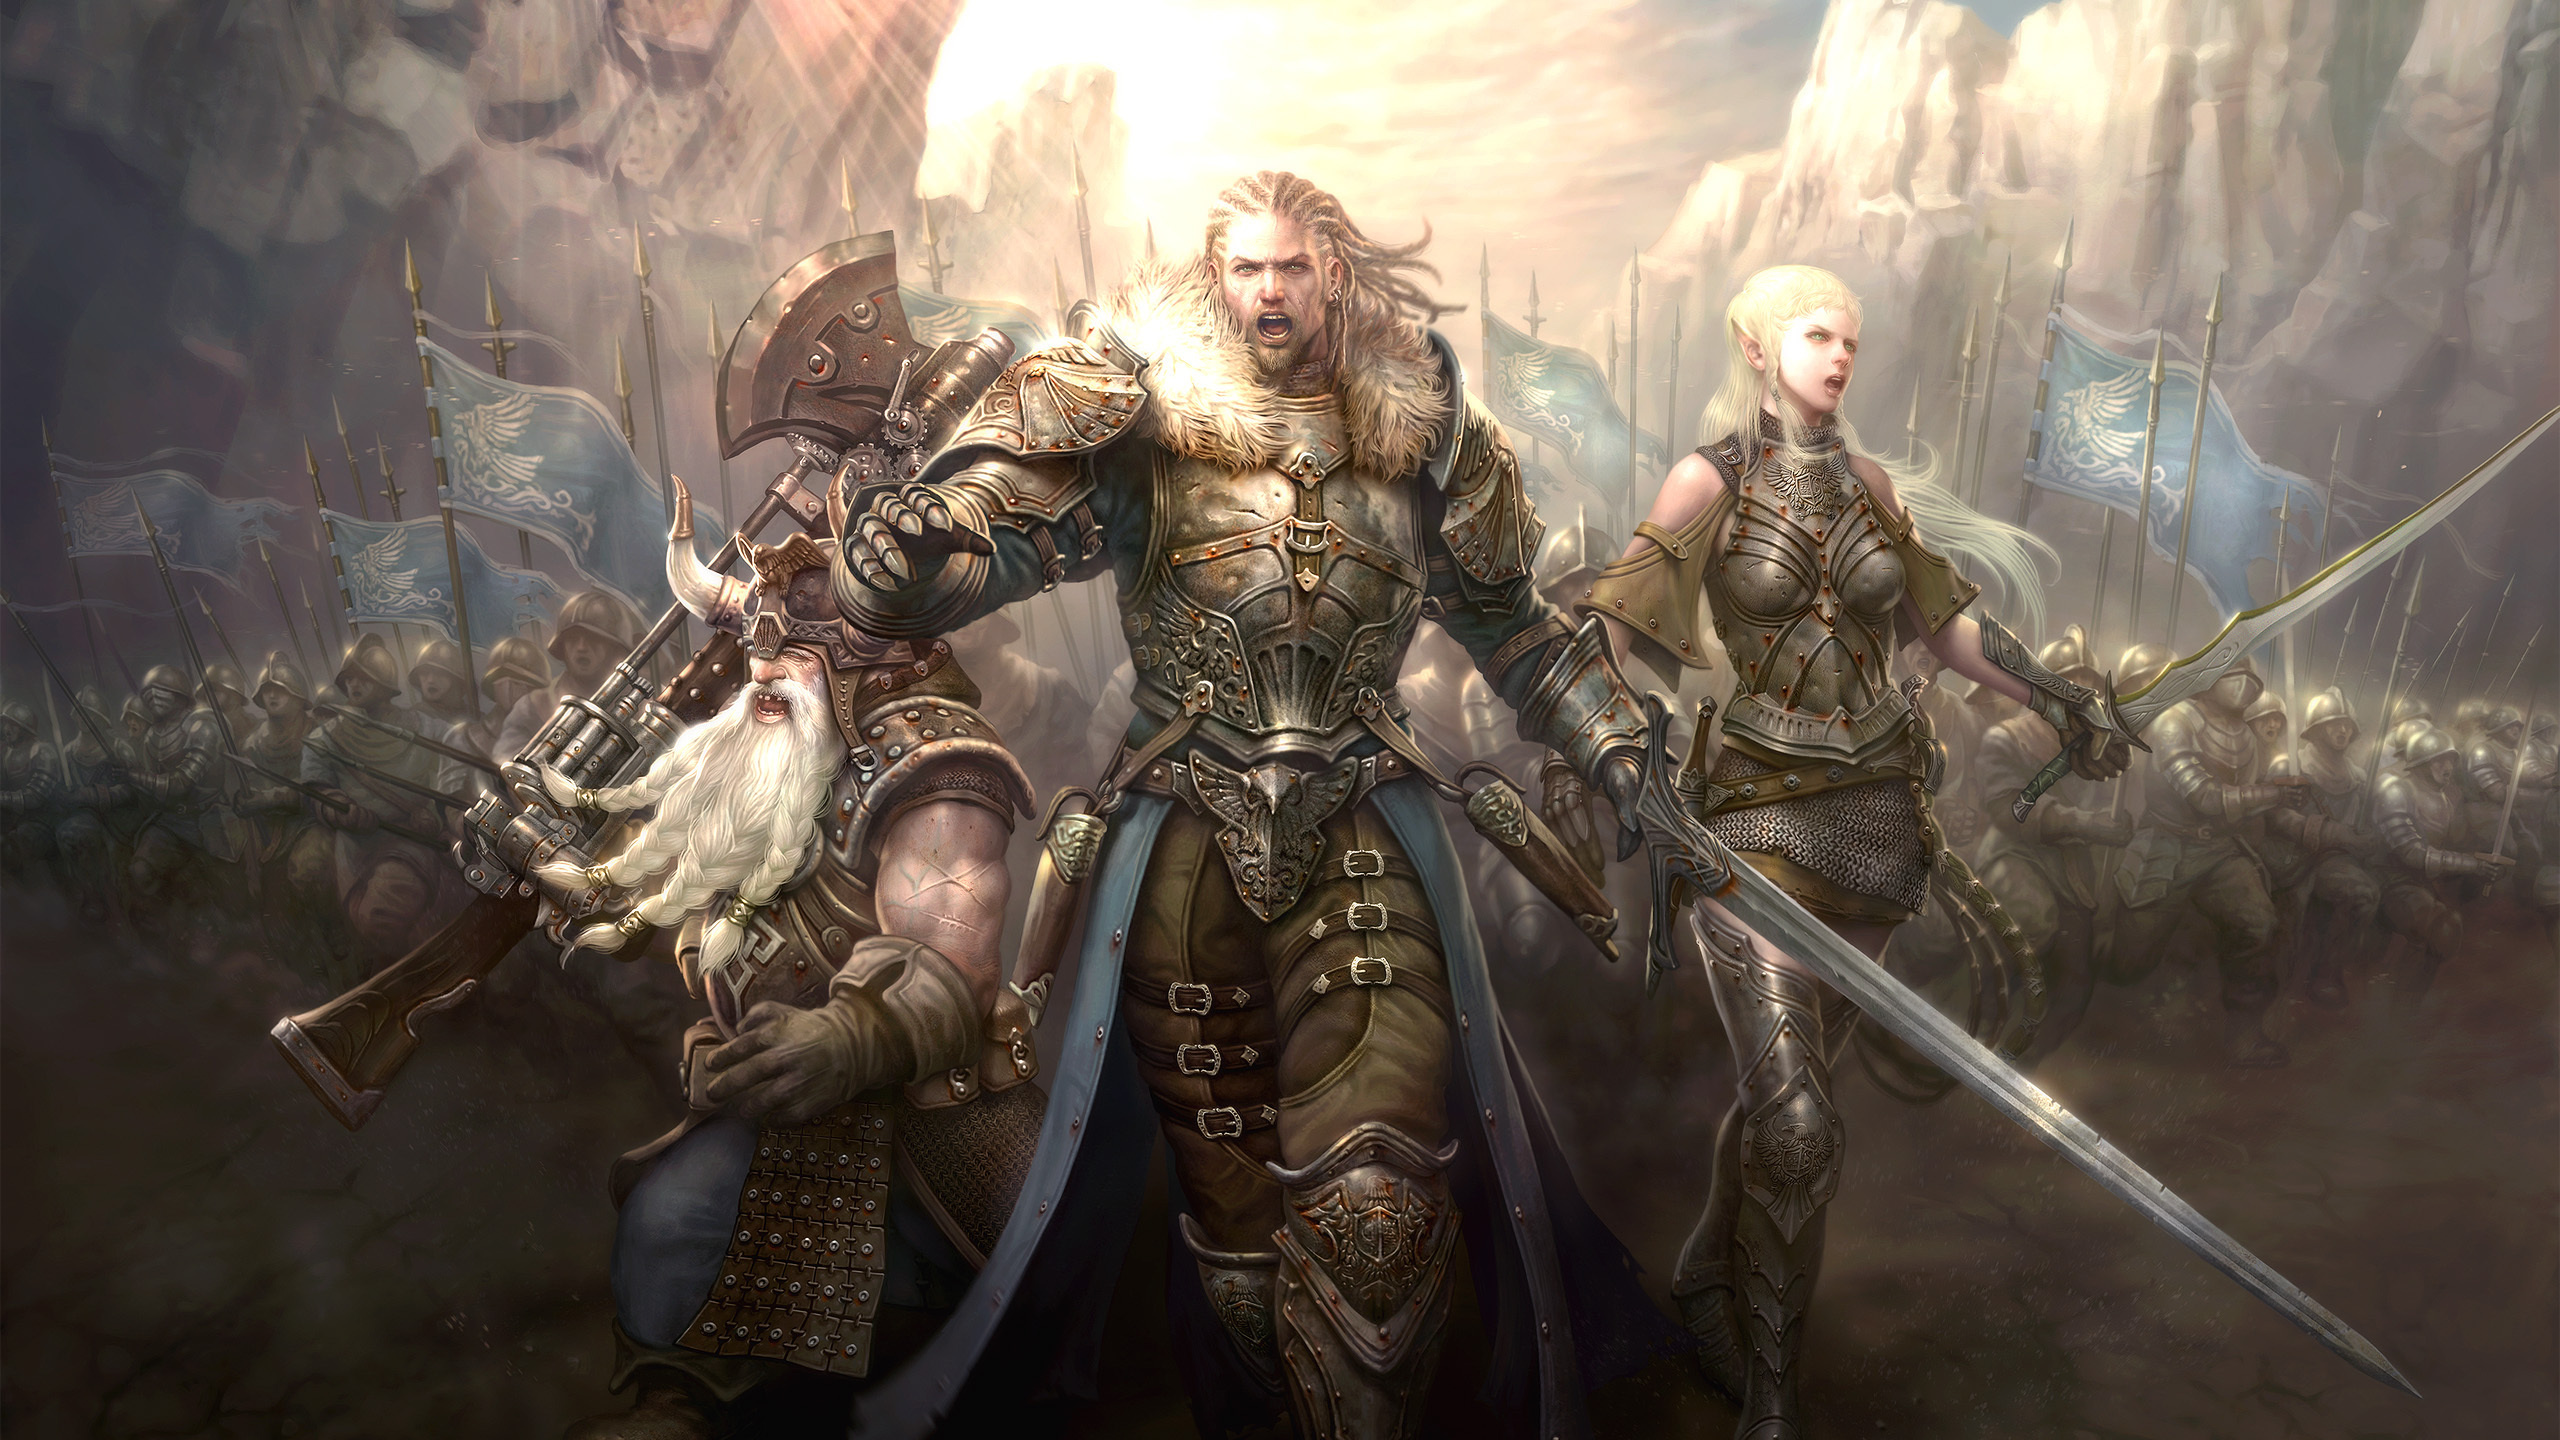 Photos For Free Battle Sword Fantasy Art To The Desktop